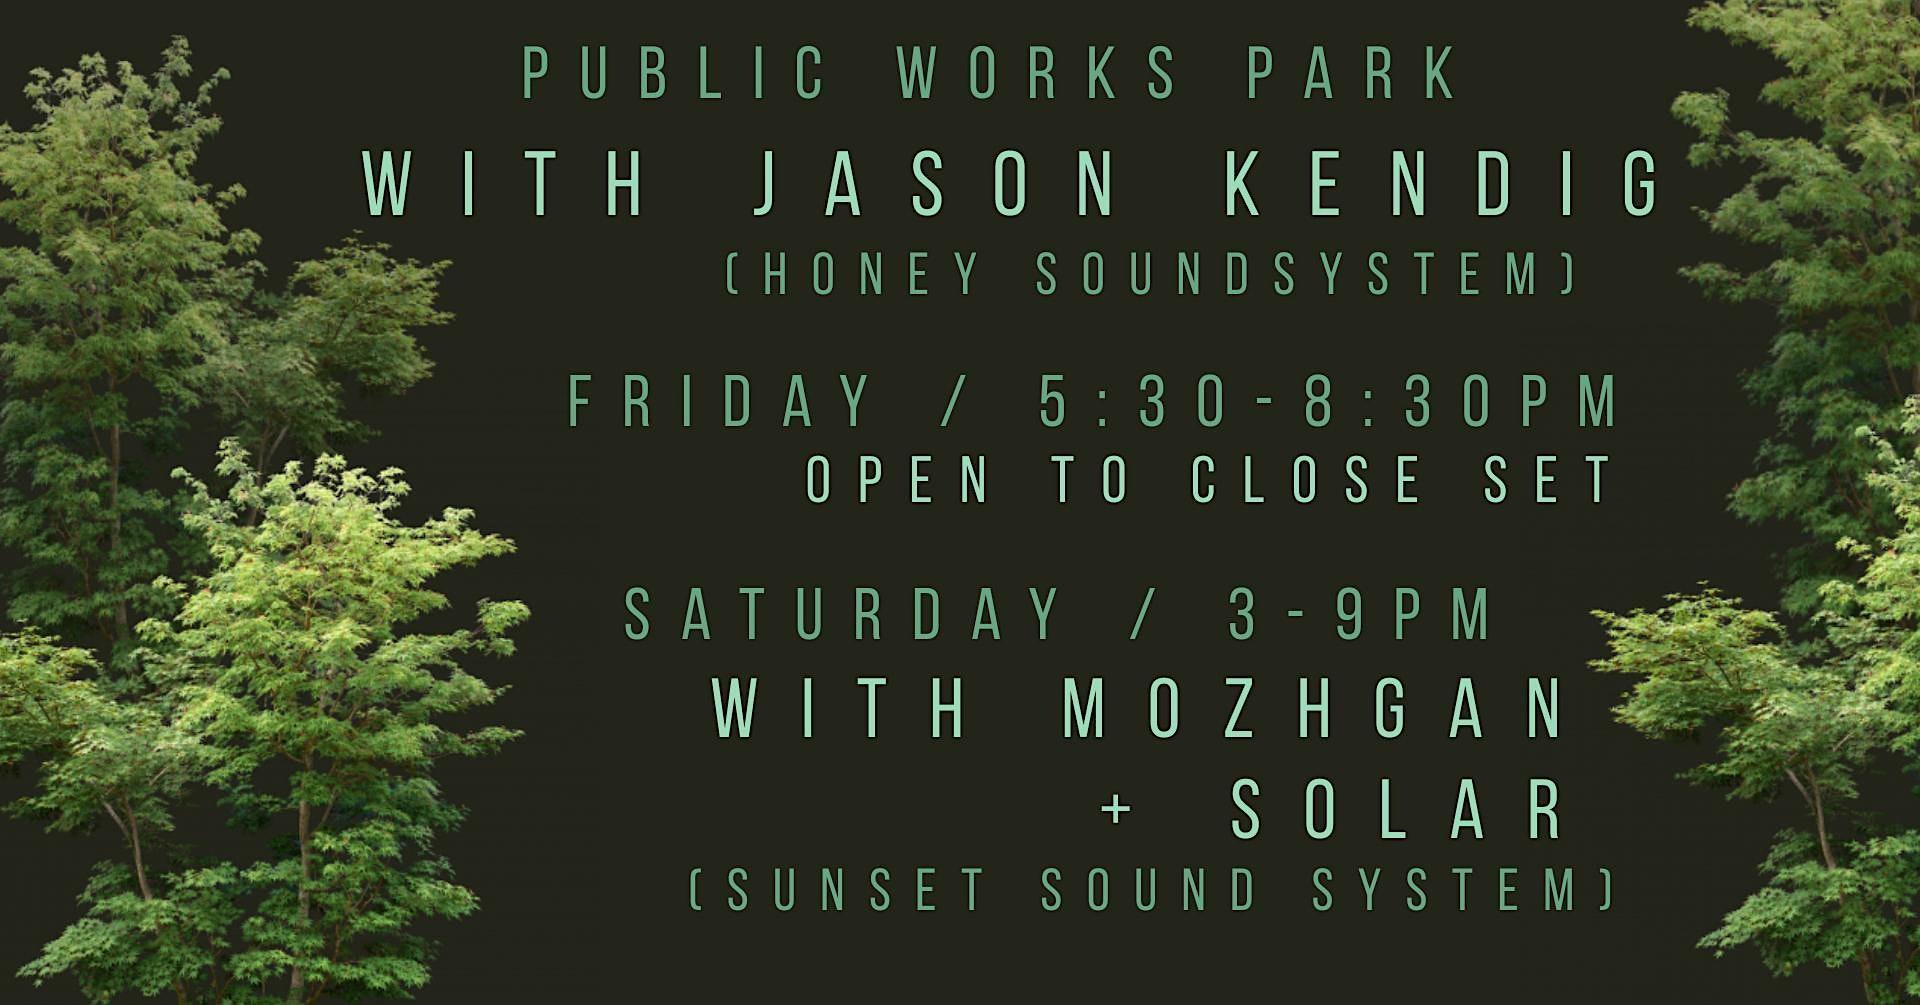 Jason Kendig (Honey Soundsystem) Open to Close at Public Works Park